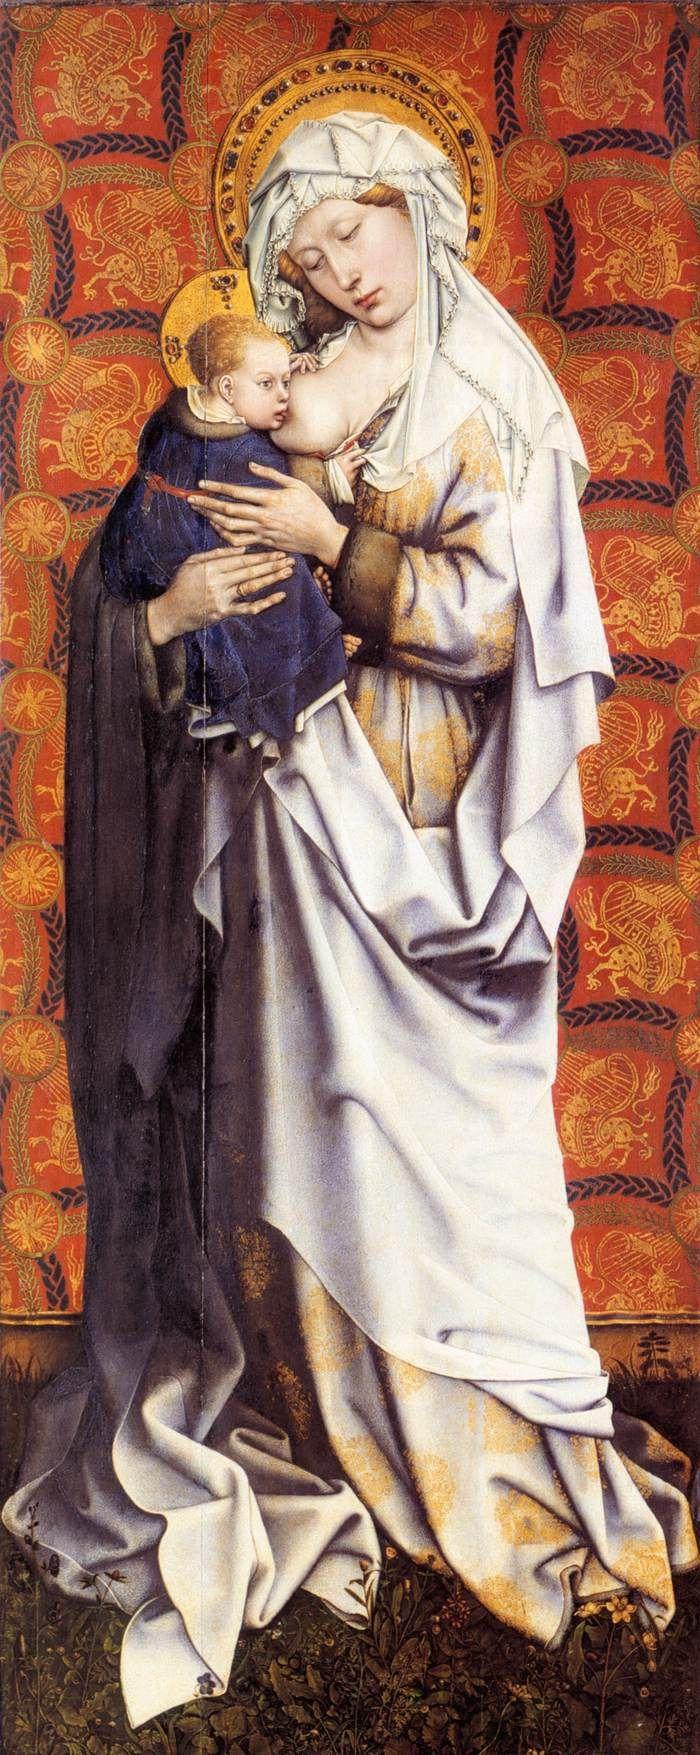 ROBERT CAMPIN (1375 - 1444) |  Virgin and Child - Stadelsches Kunstinstitut, Frankfurt,Germany